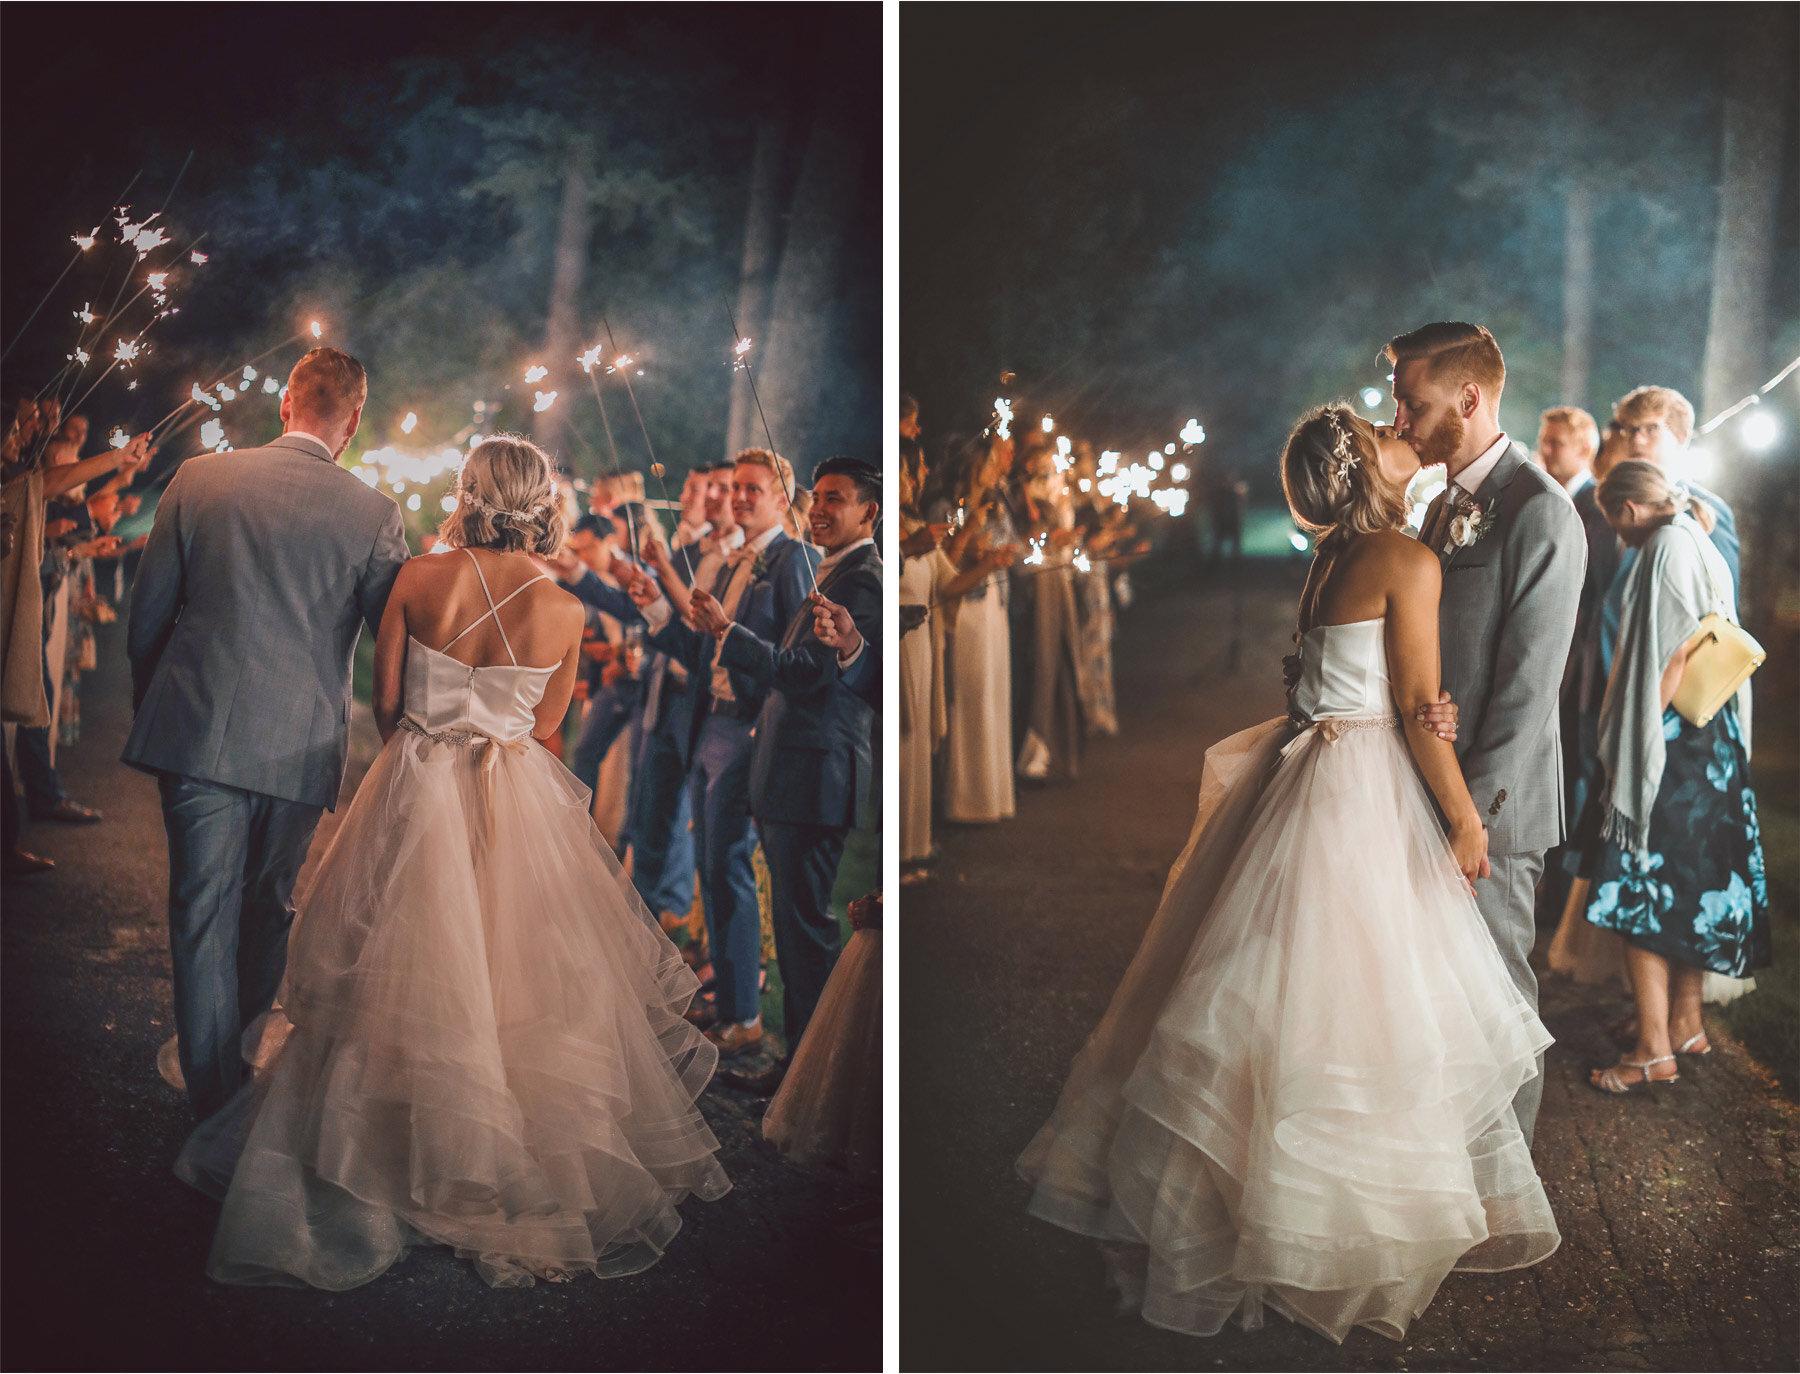 22-Vick-Photography-Wedding-Duluth-Minnesota-Glensheen-Mansion-Sparkler-Send-Off-Kiss-Catherine-and-John.jpg.jpg